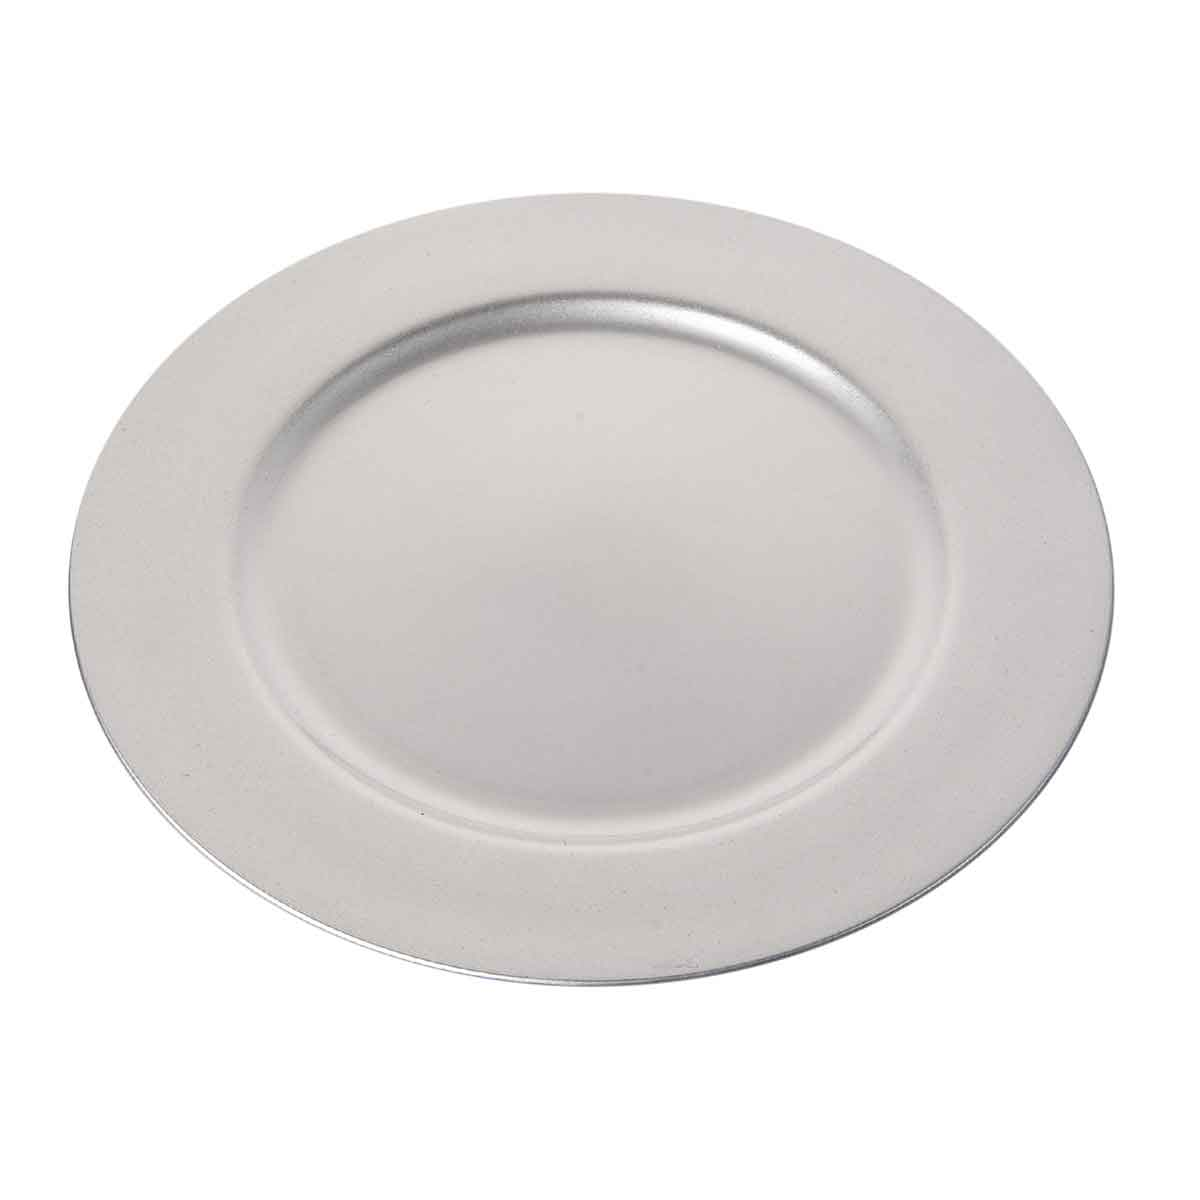 Sottopiatto argento diametro 33cm